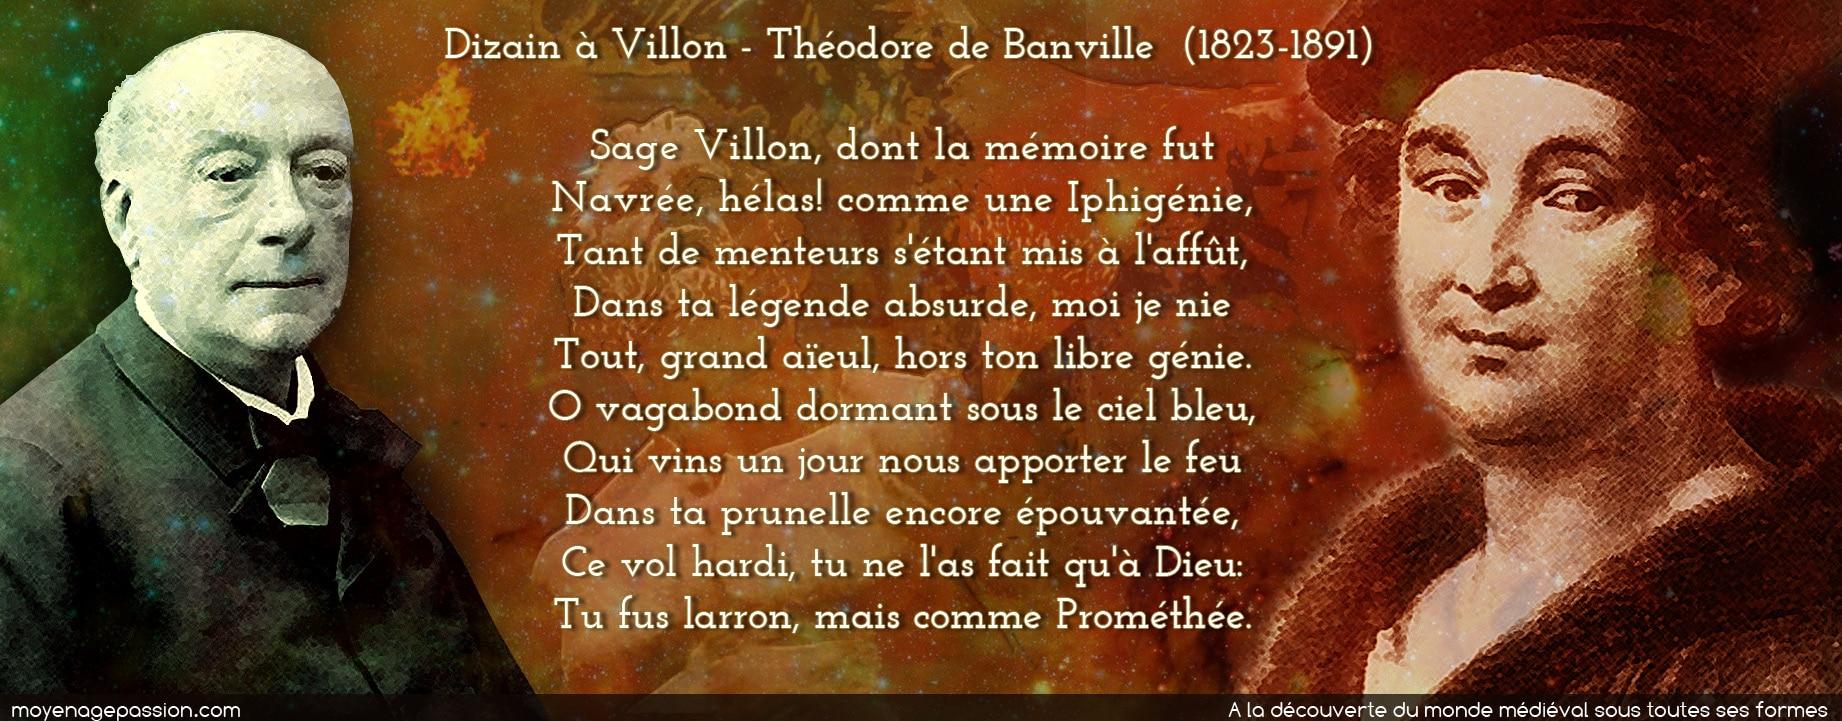 poesie_medievale_theodore_banville_dizain_francois_villon